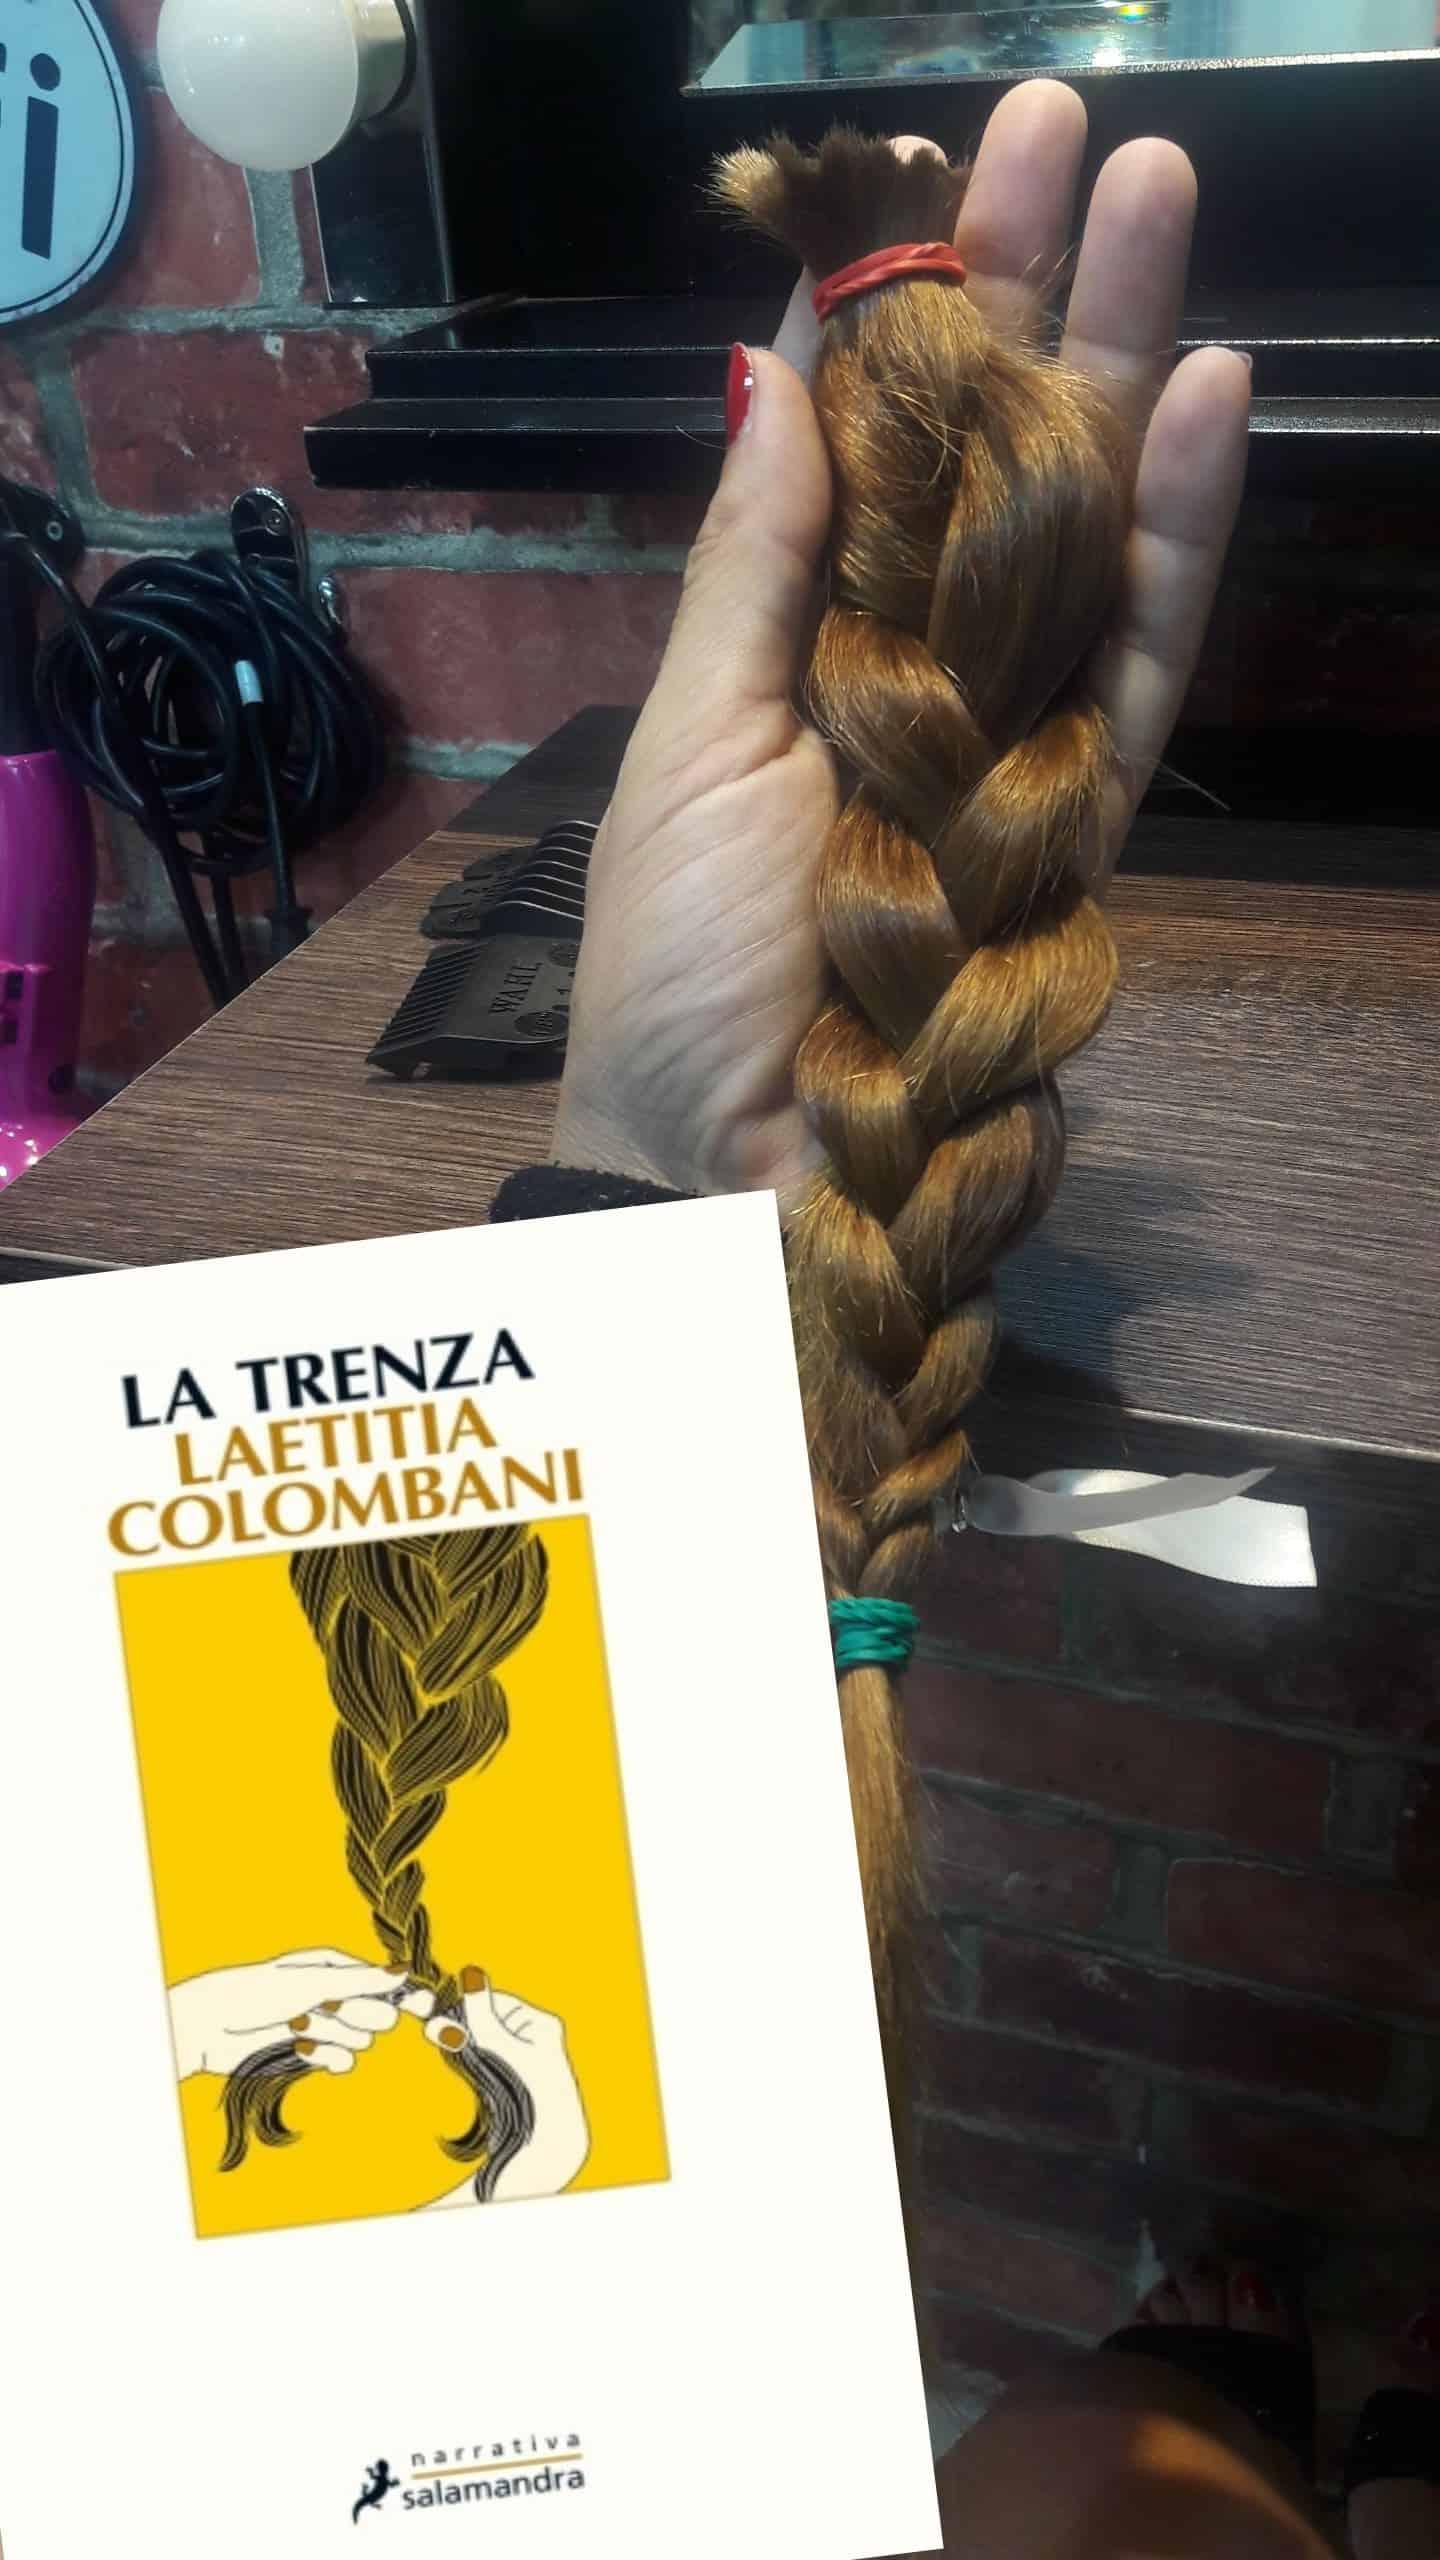 «LA TRENZA», de Laetitia Colombani